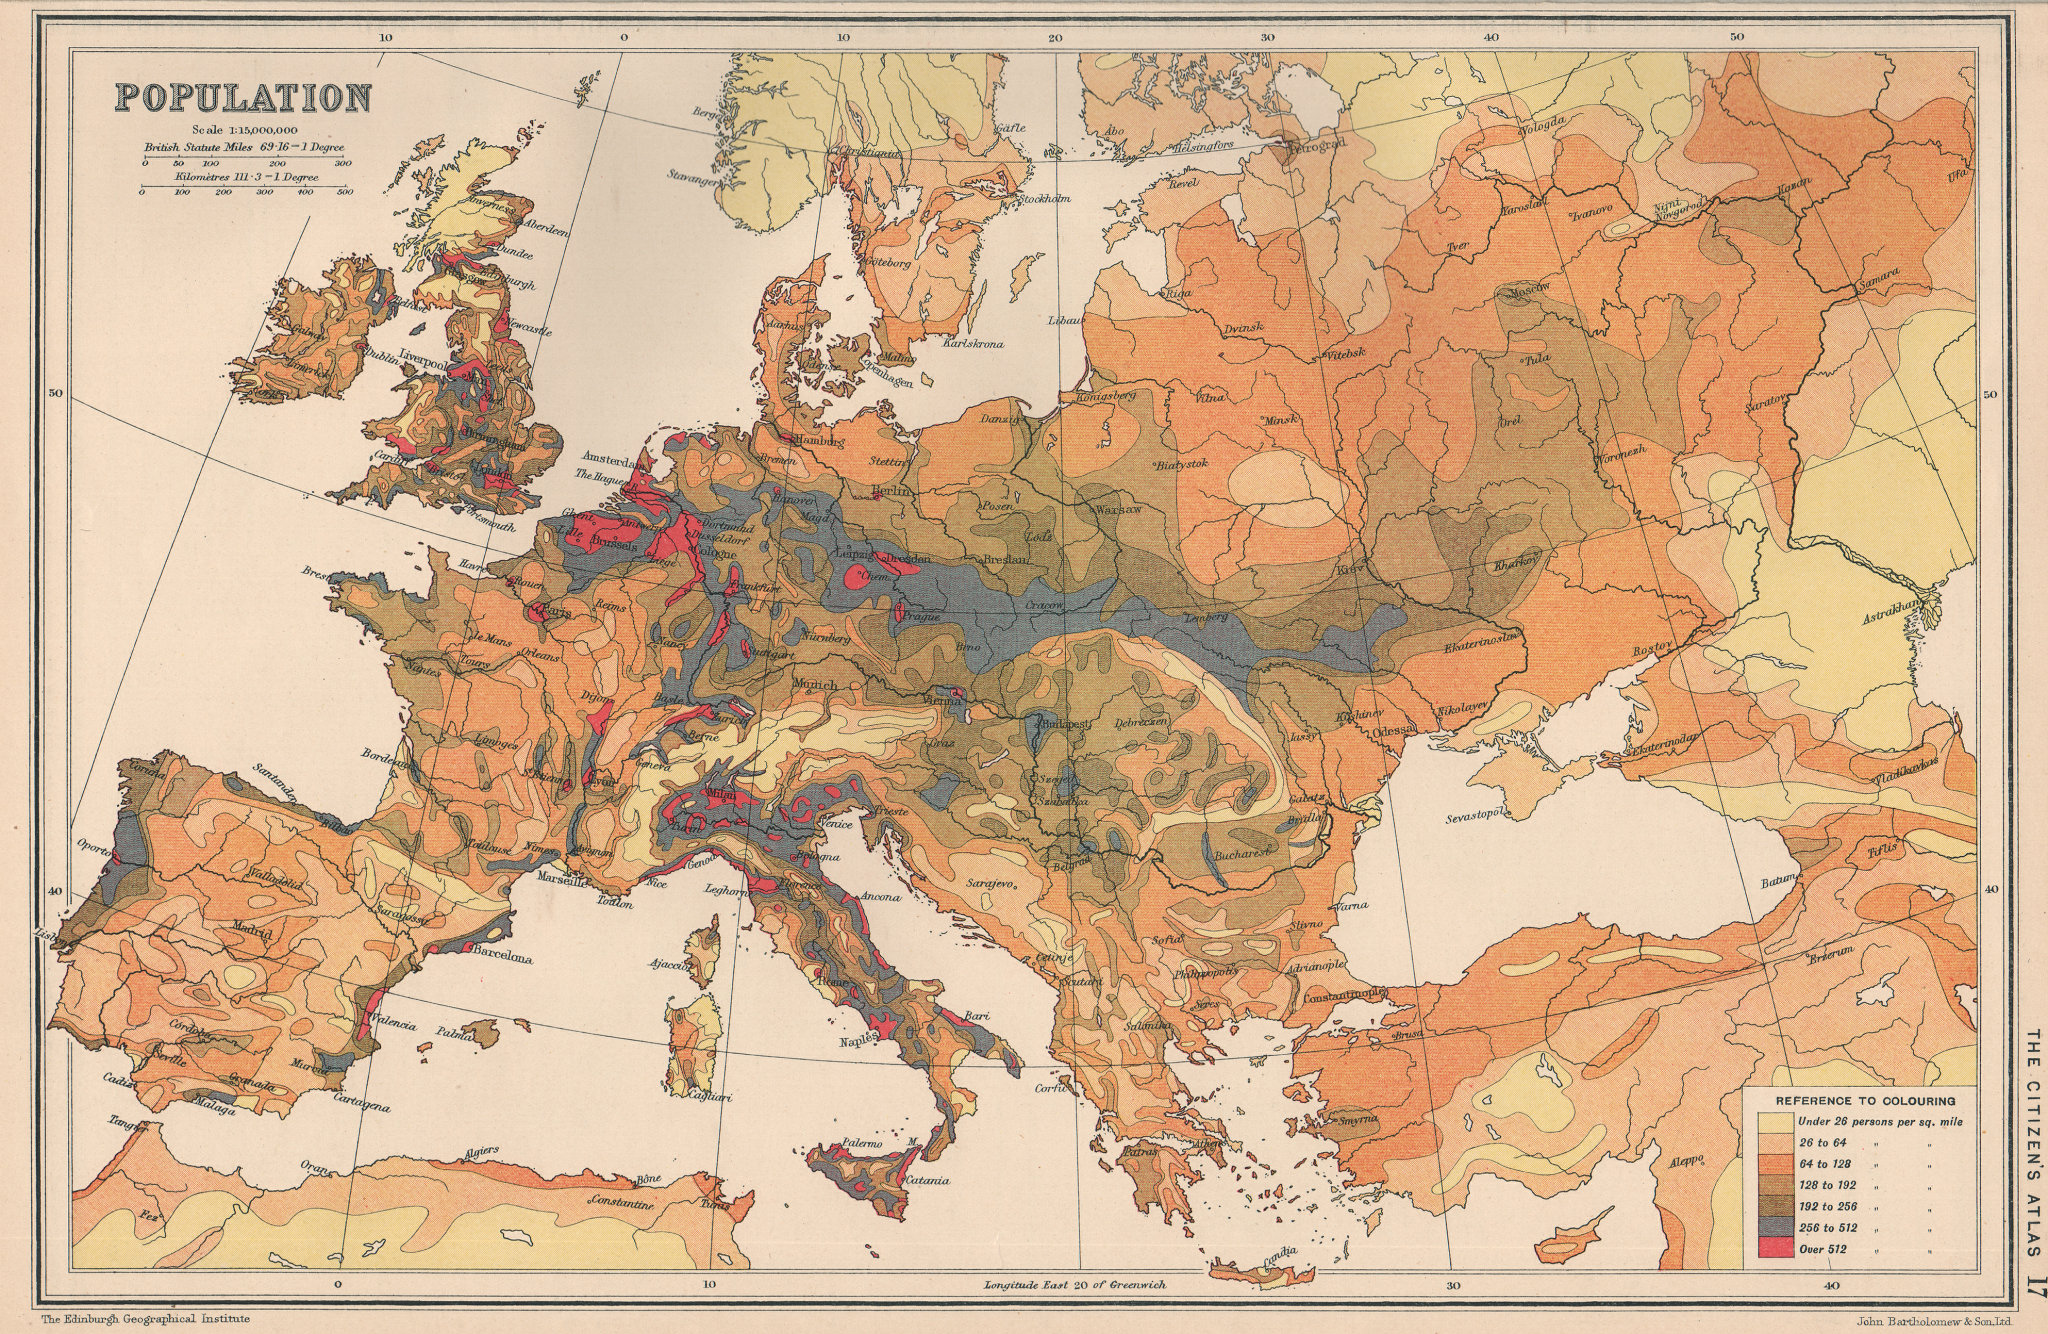 Associate Product EUROPE. Population density. BARTHOLOMEW 1924 old vintage map plan chart